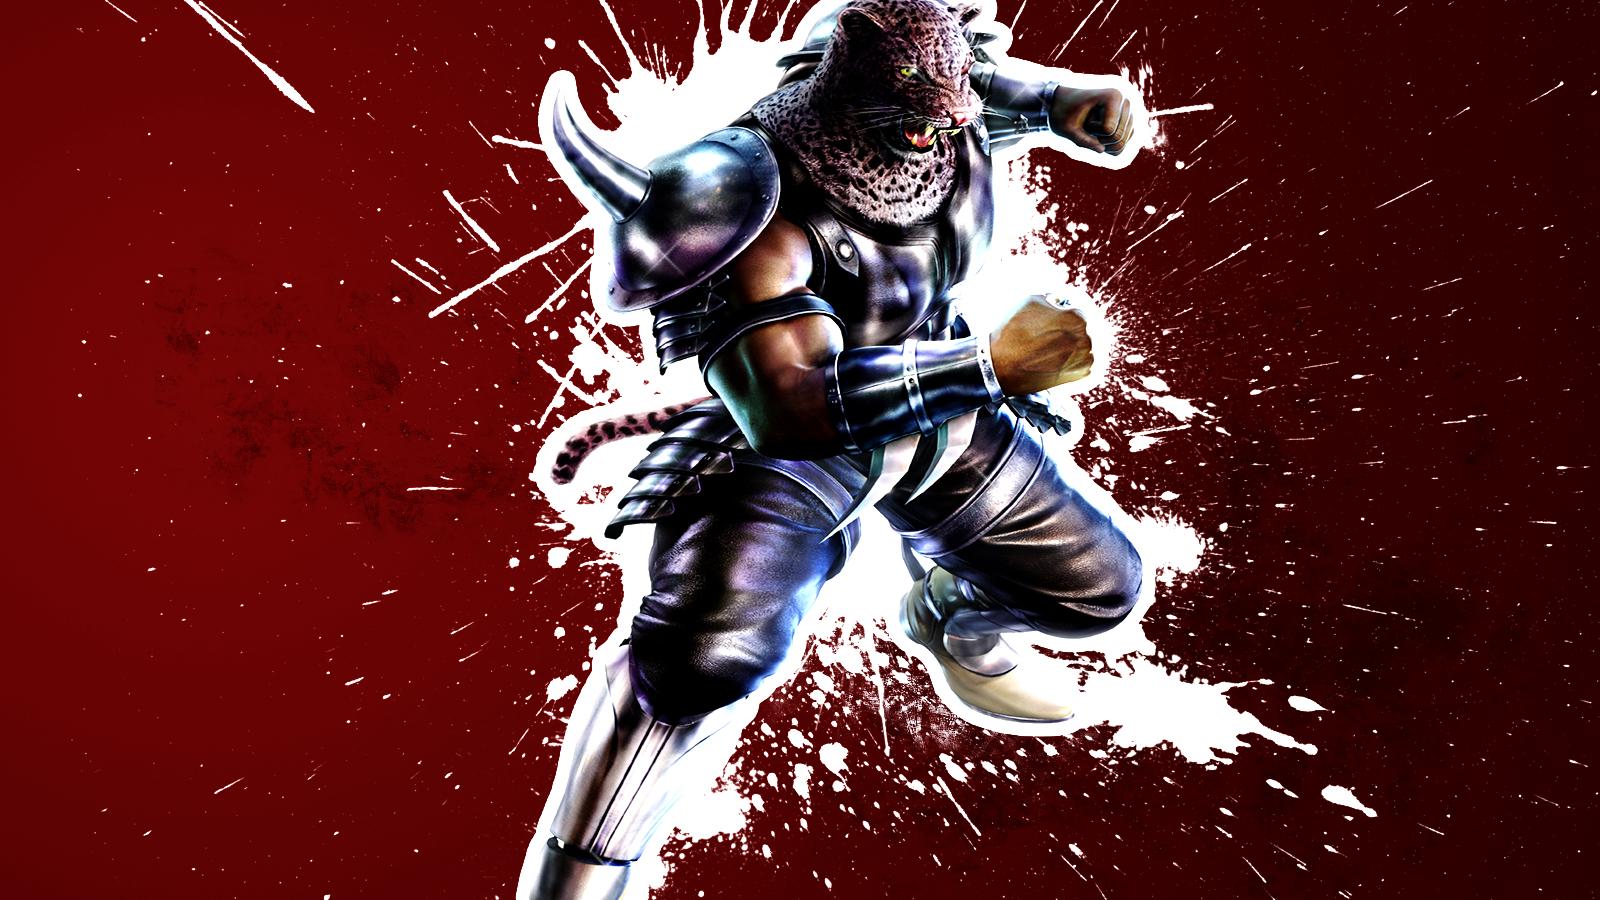 Free Download Armor King Tekken Hd Wallpapers Download Wallpapers